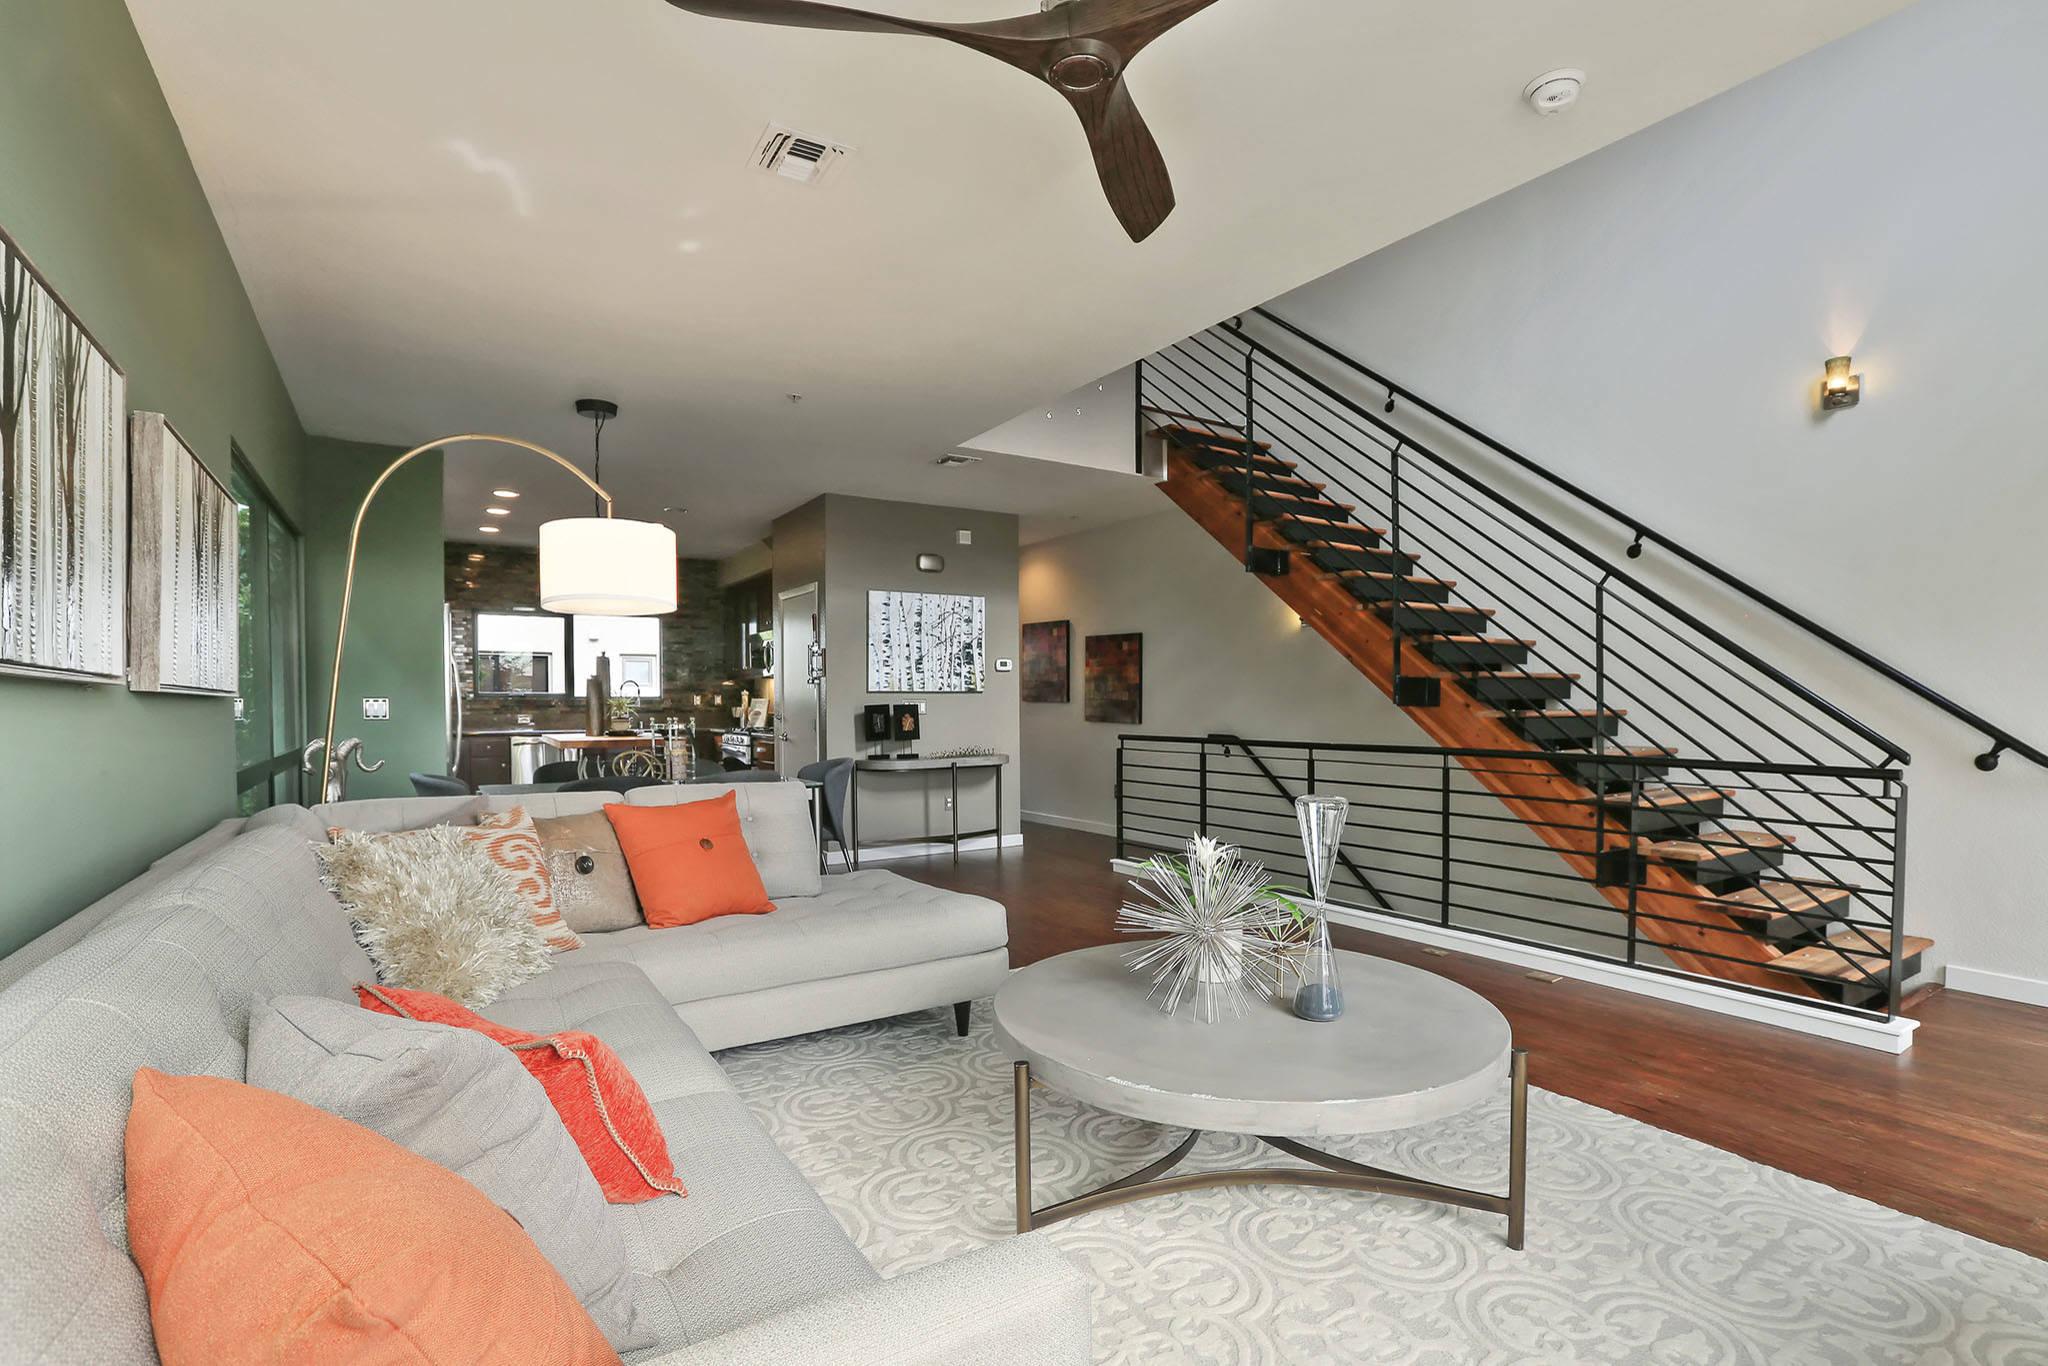 Loft-Style Townhome in West Oakland